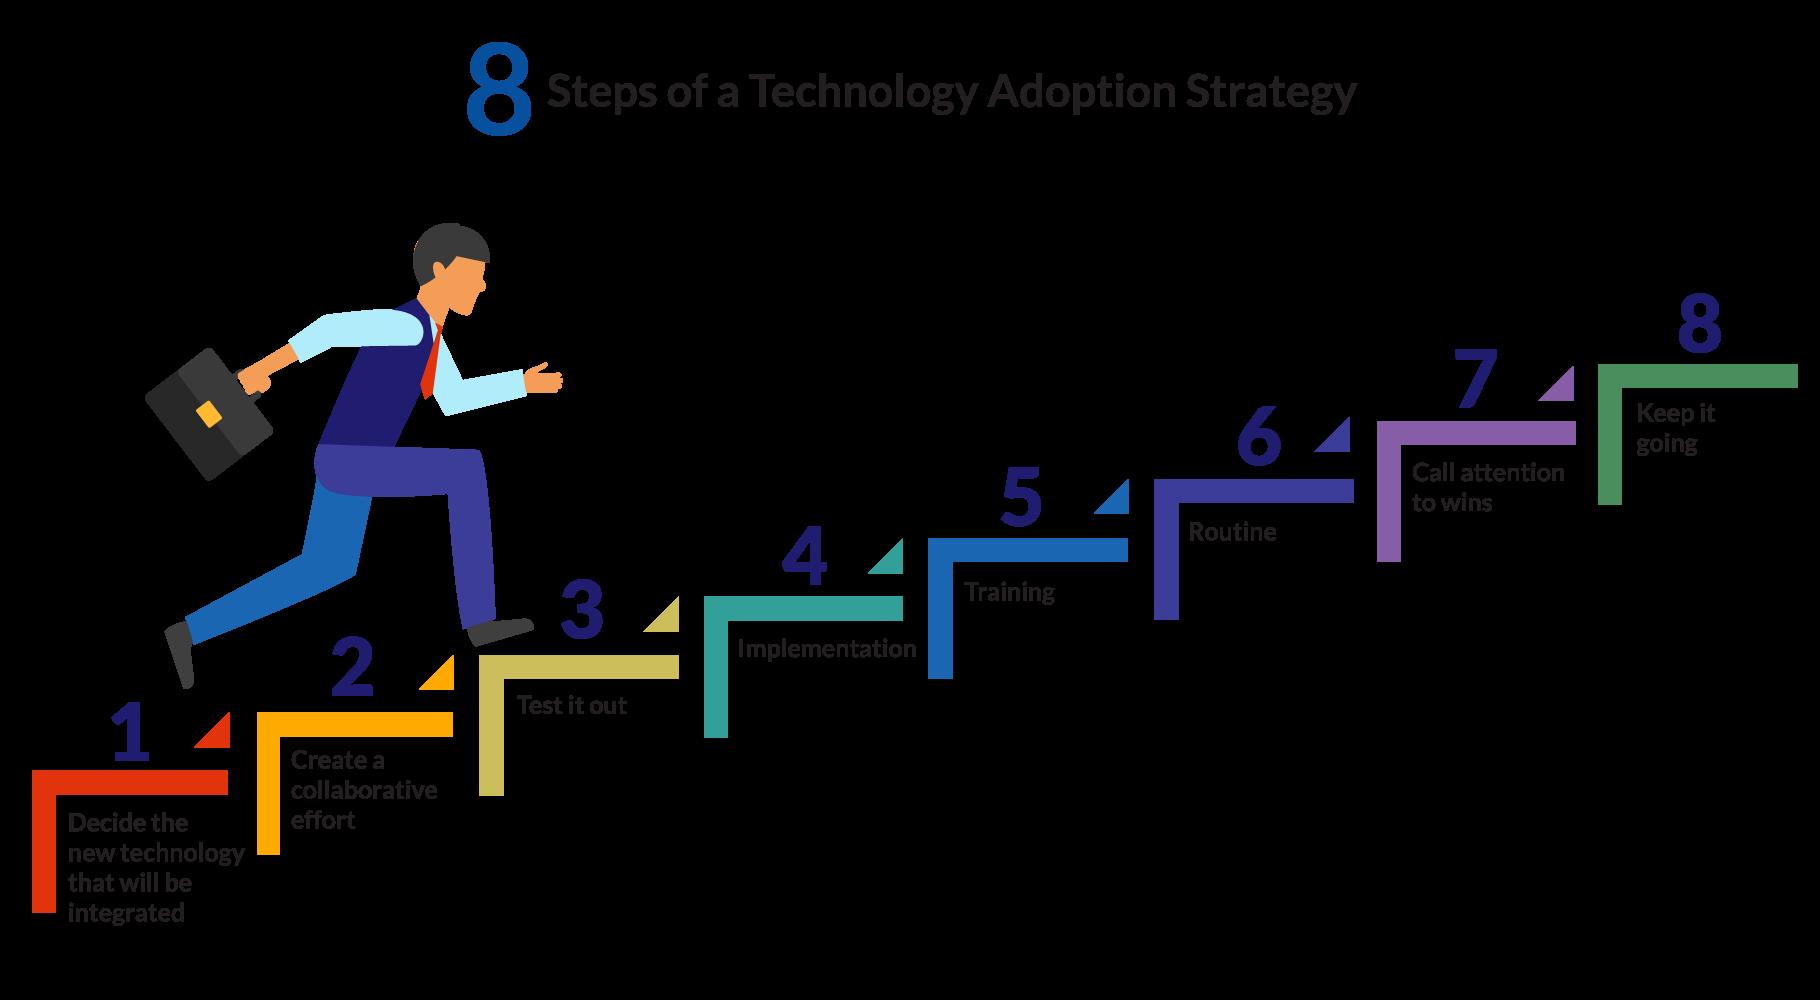 Steps of a technology adoption strategy